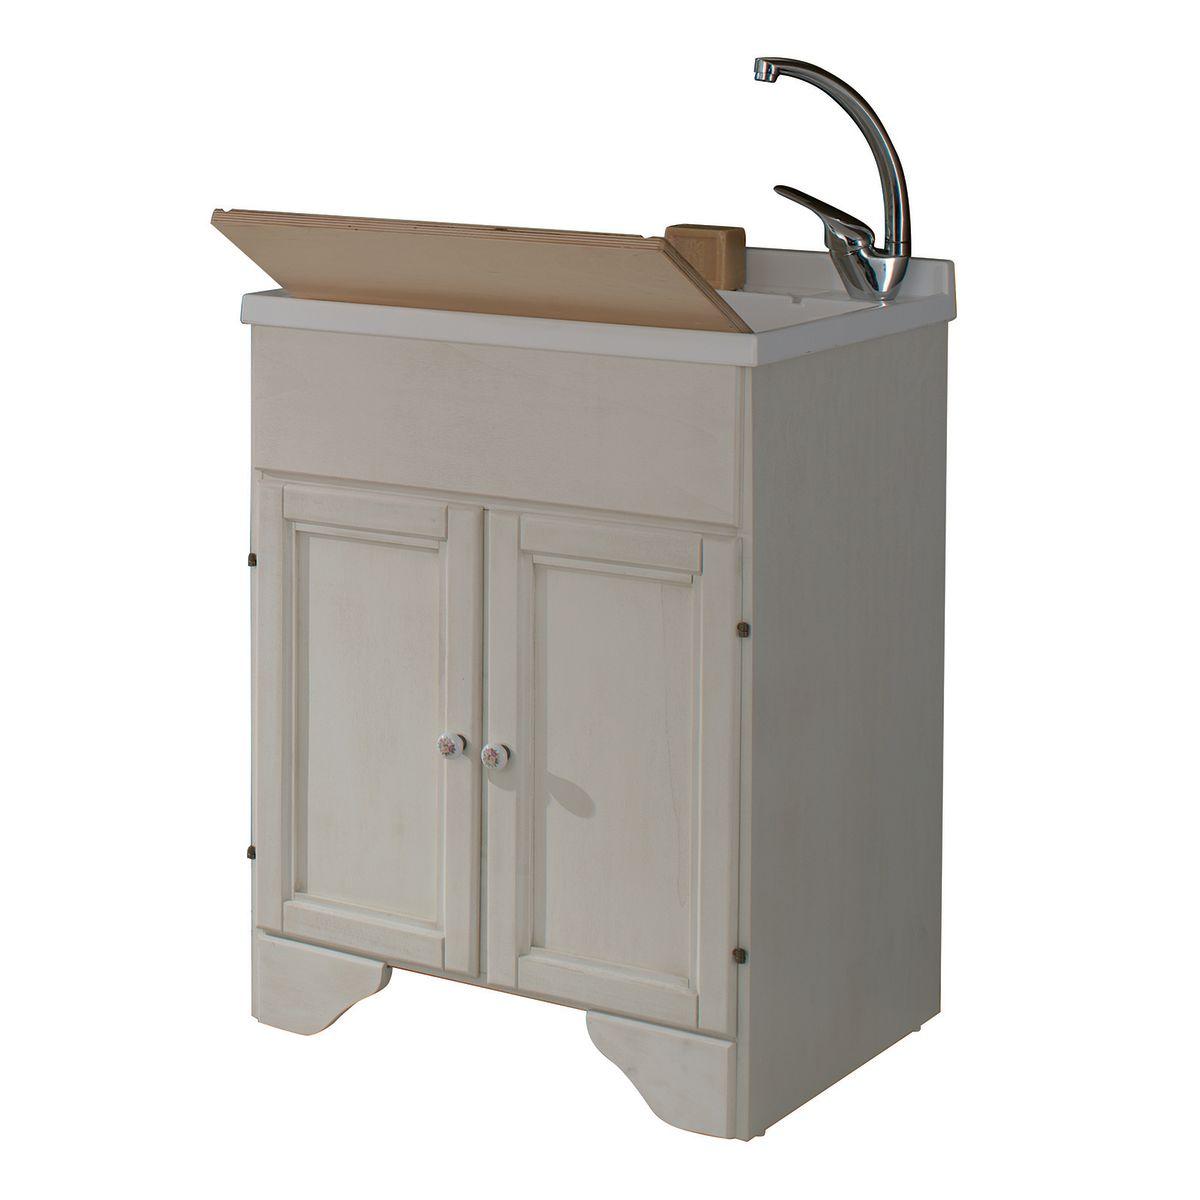 Mobili lavatrice bagno top best mobili lavatrice bagno mobili per lavatrice nancopi with arredo - Mobile porta lavatrice e asciugatrice leroy merlin ...